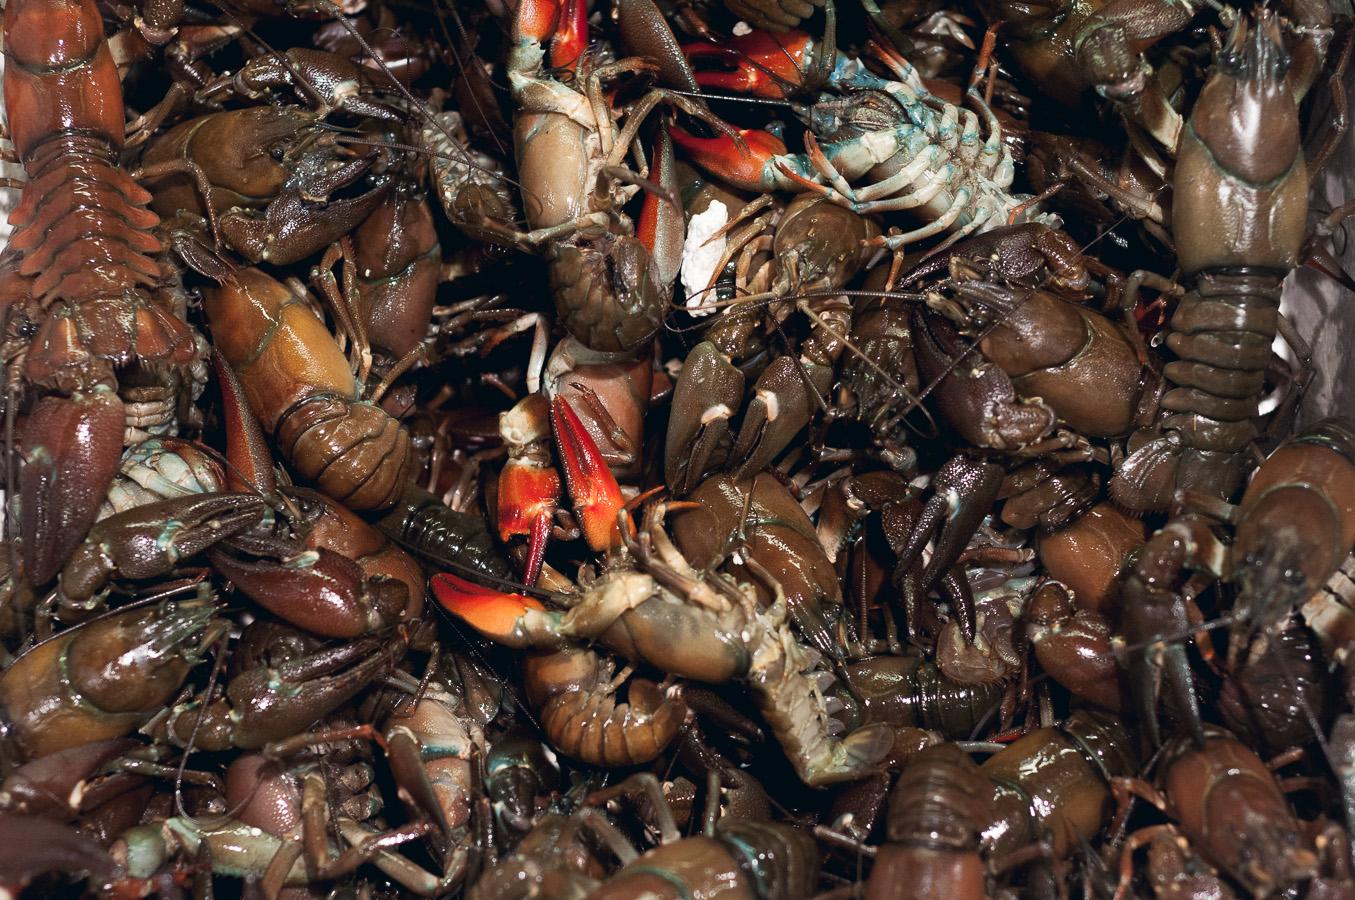 billings-gate-market-crayfish-bundle.jpg